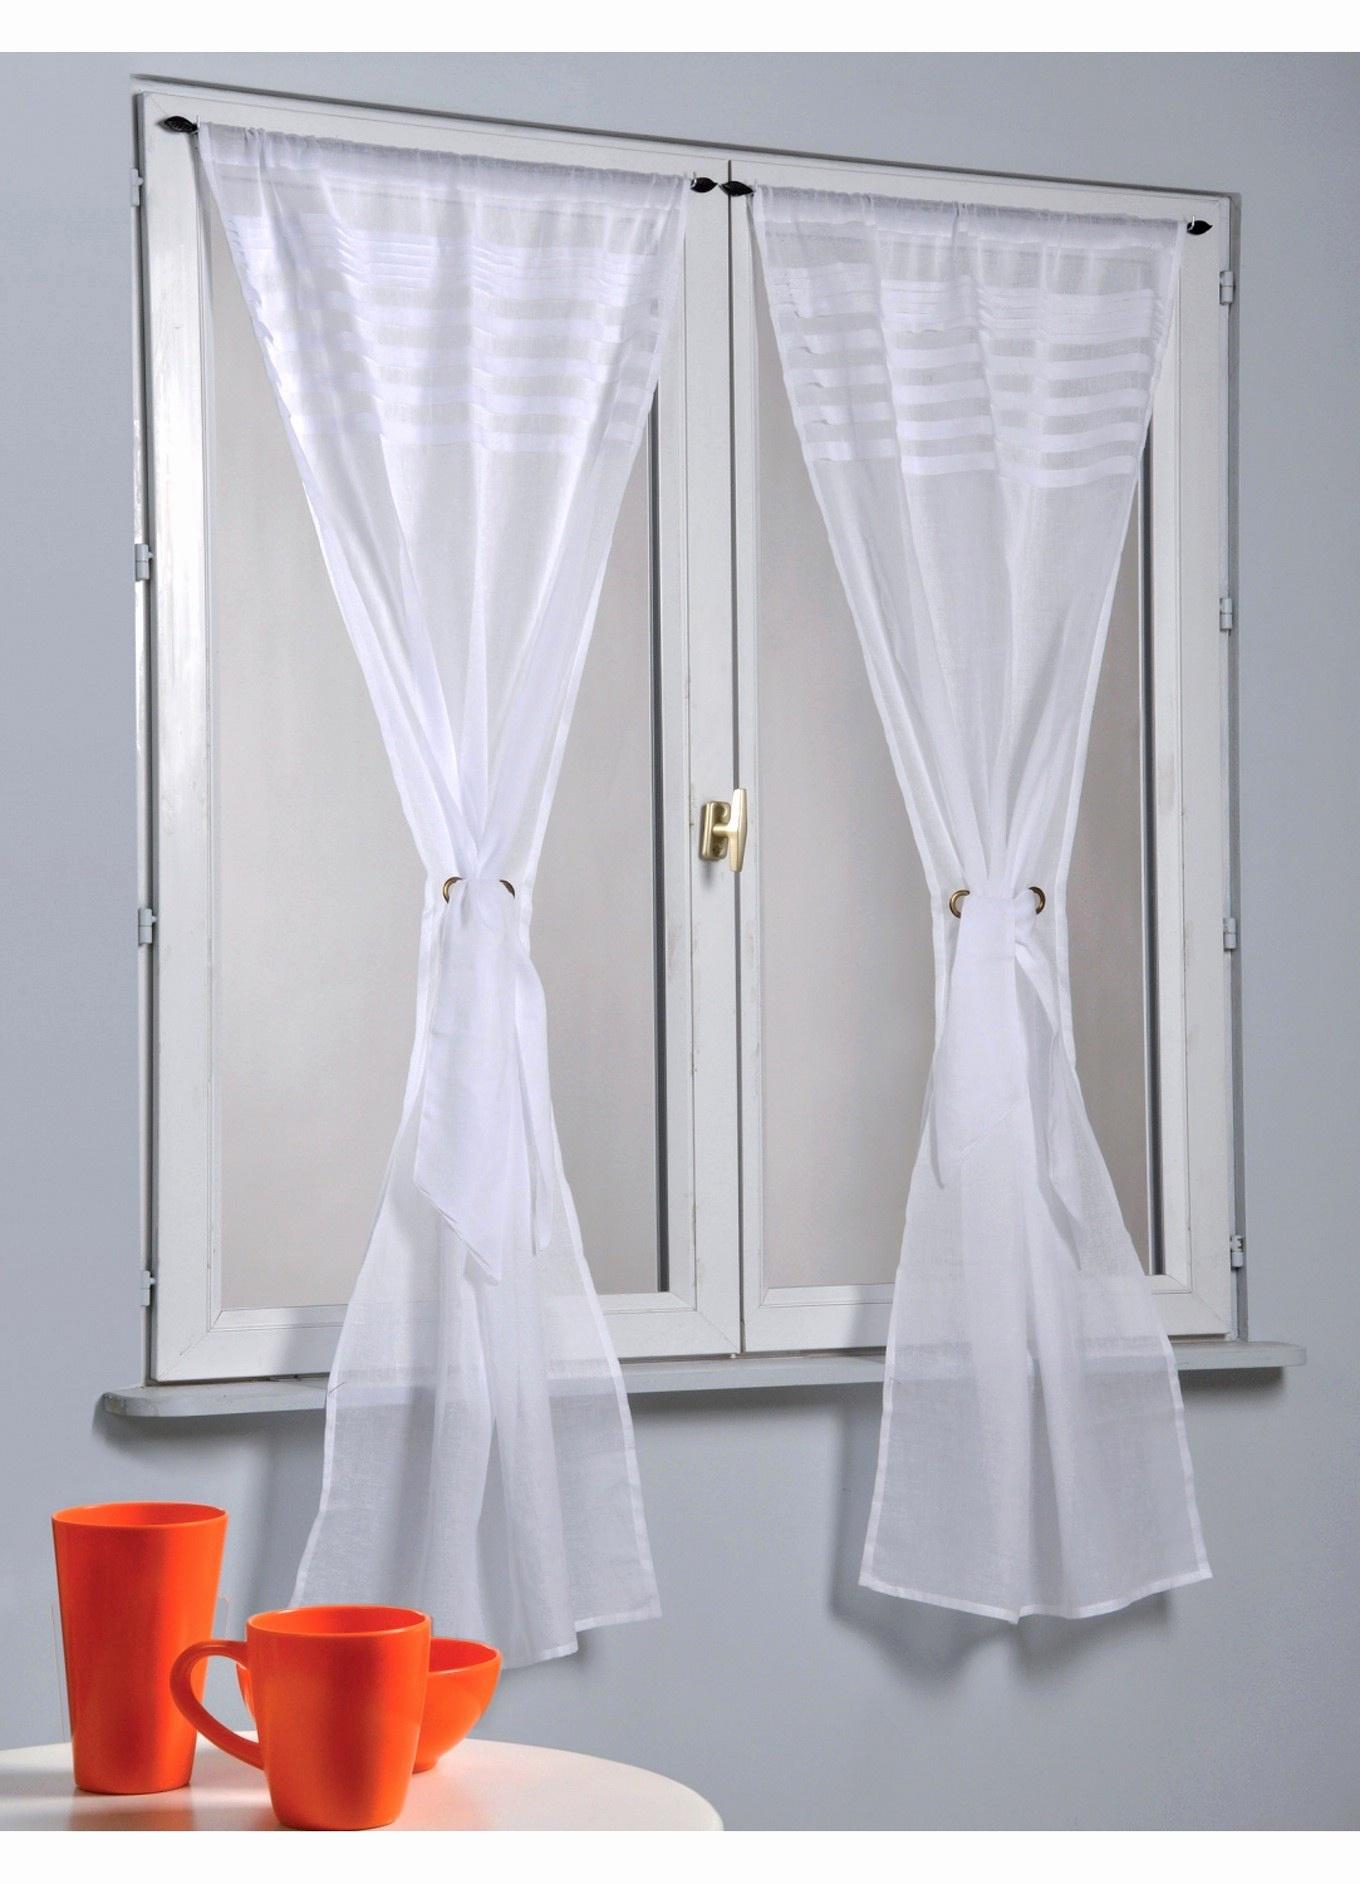 Rideau Anti Mouche Leroy Merlin - Acoliheritage concernant Rideau De Porte Anti Mouche Ikea